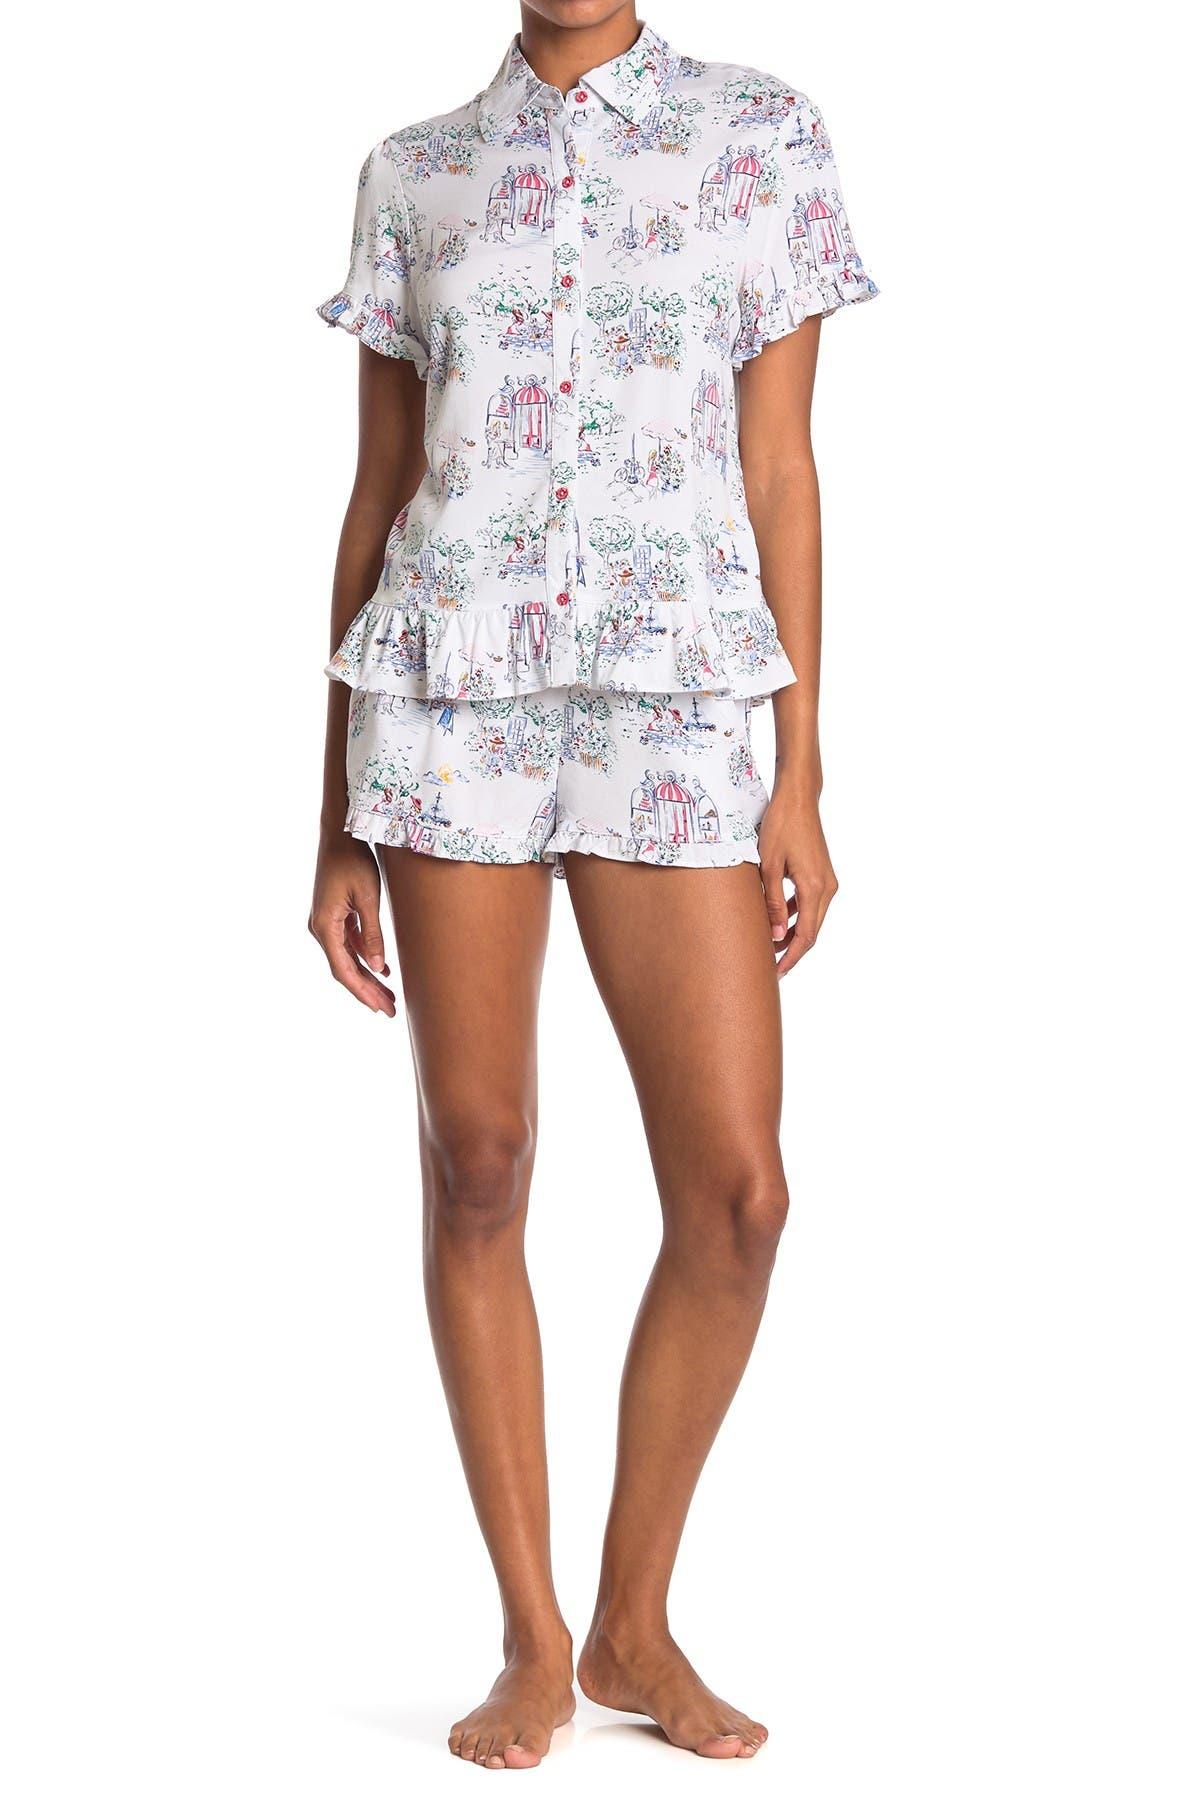 Image of Jane & Bleecker New York Cozy Patterned 2-Piece Ruffle Frill Pajama Set